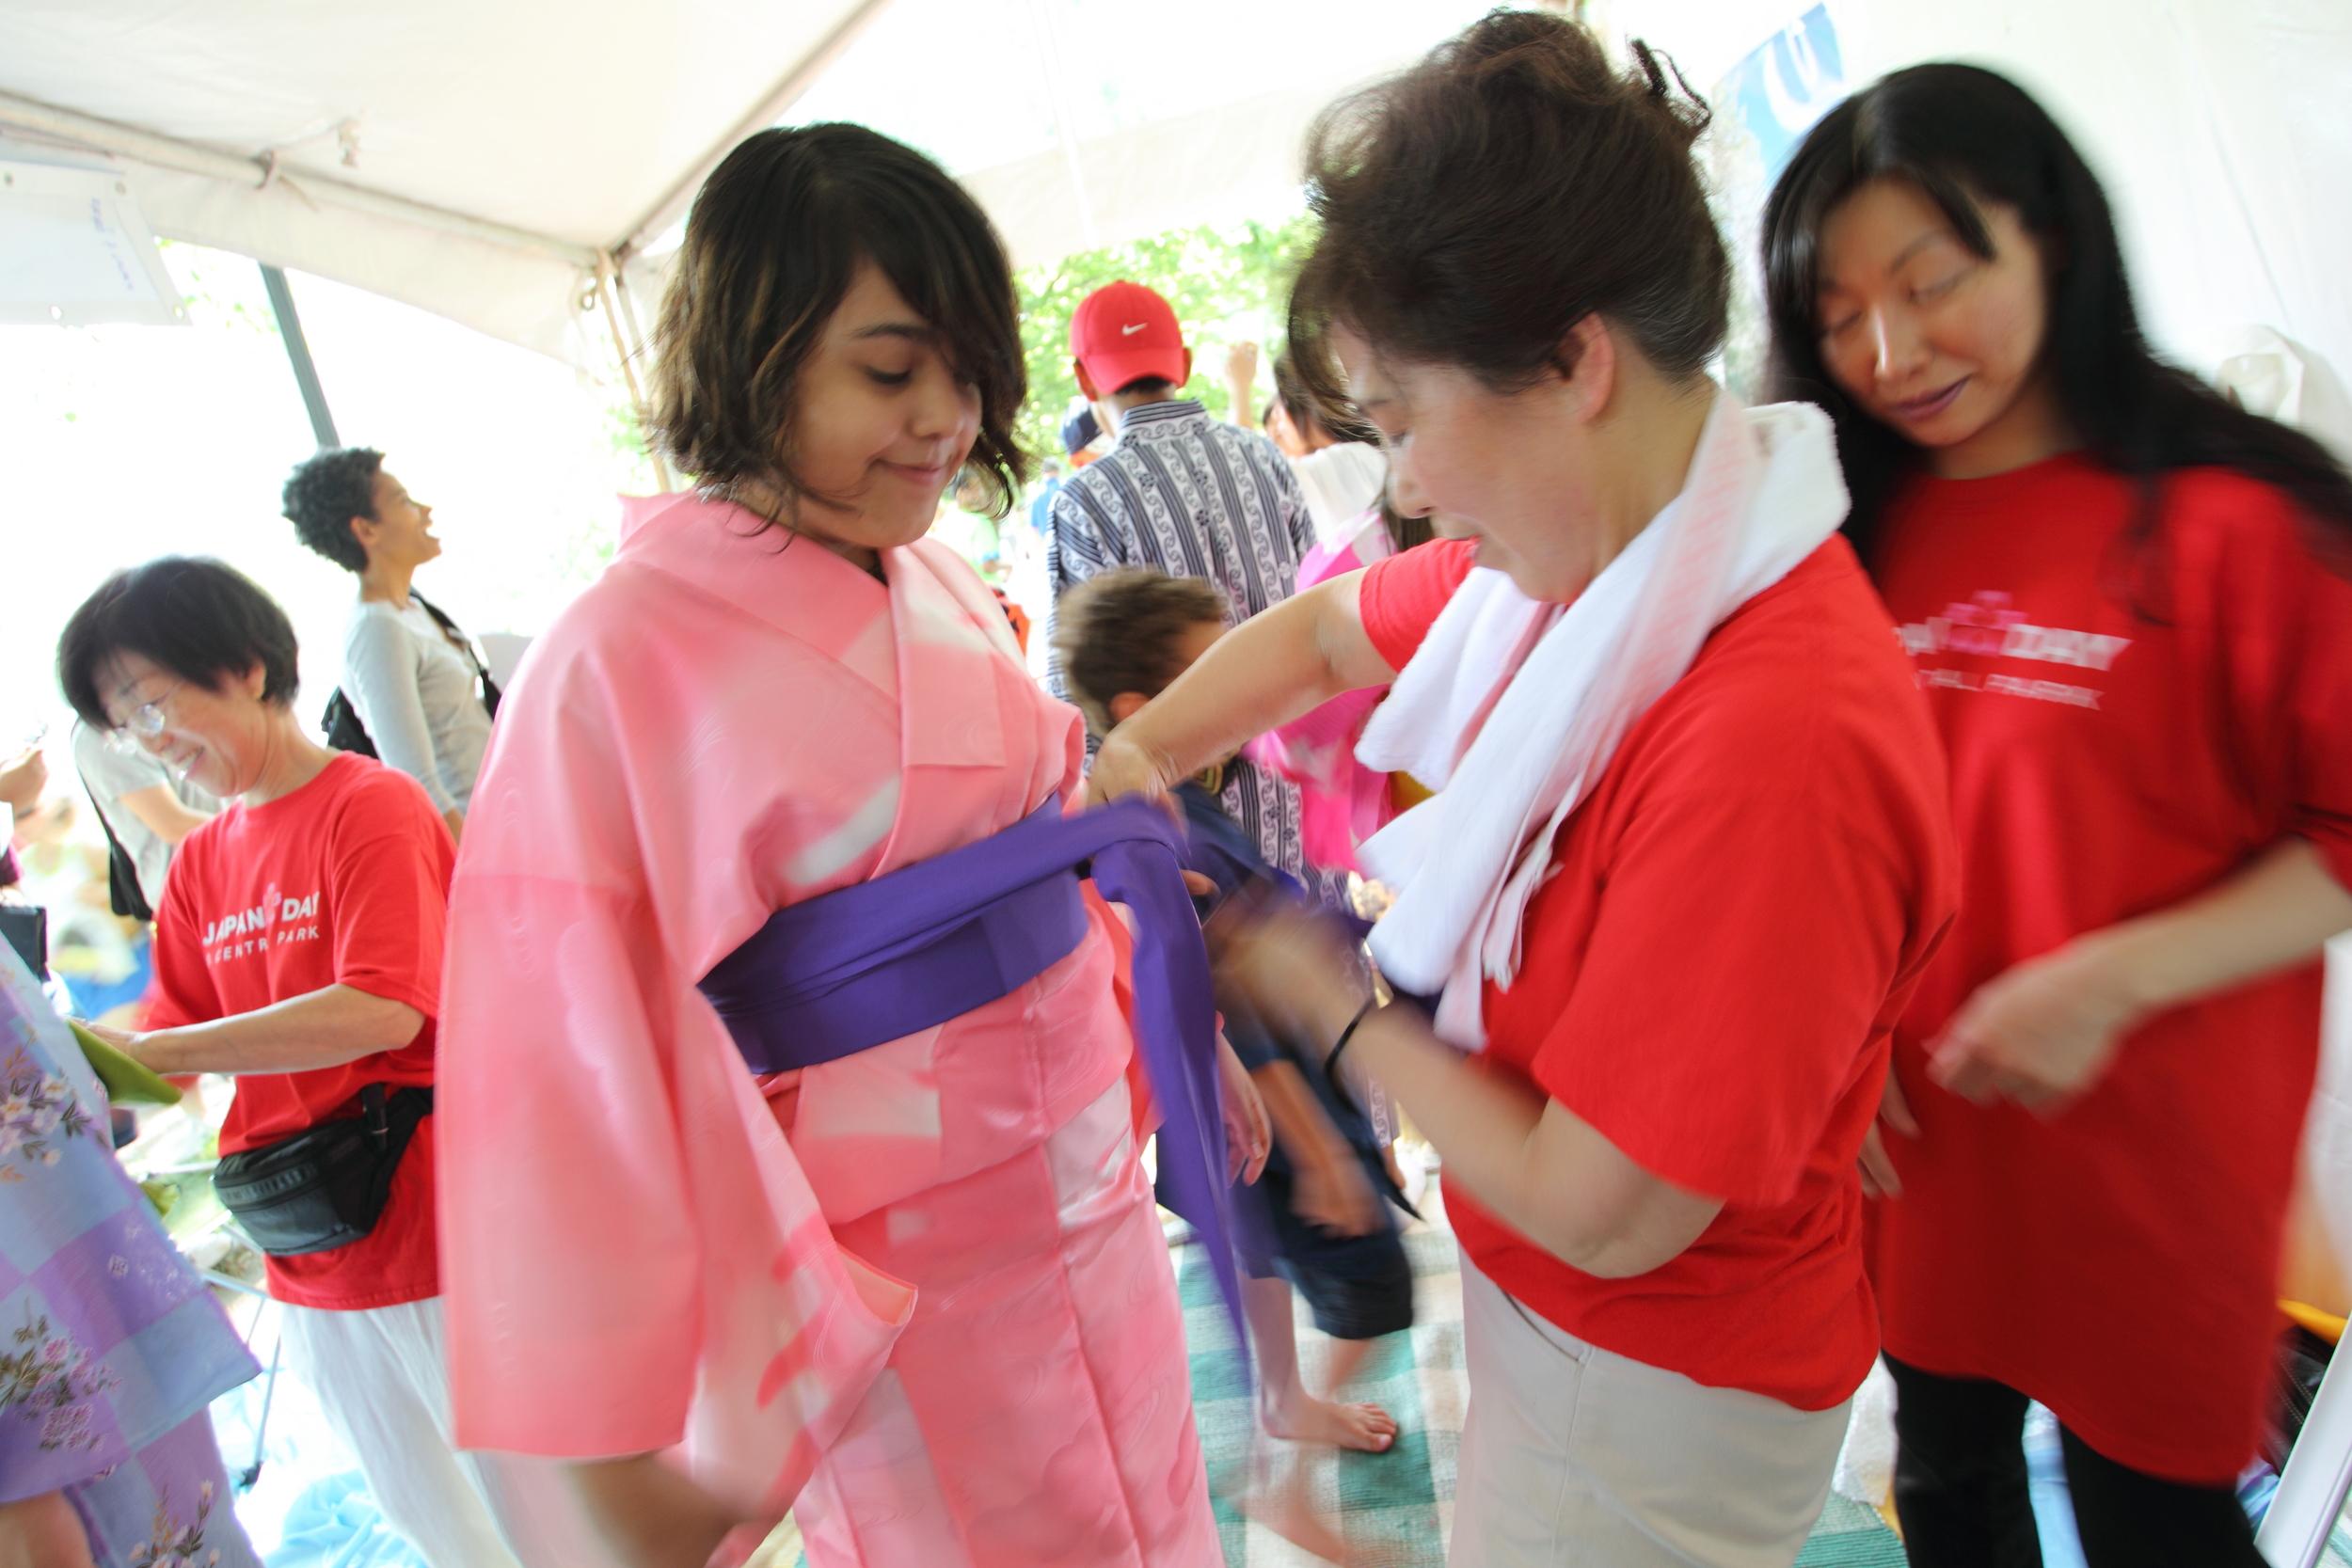 Japan Day 2010-0606-00137.JPG